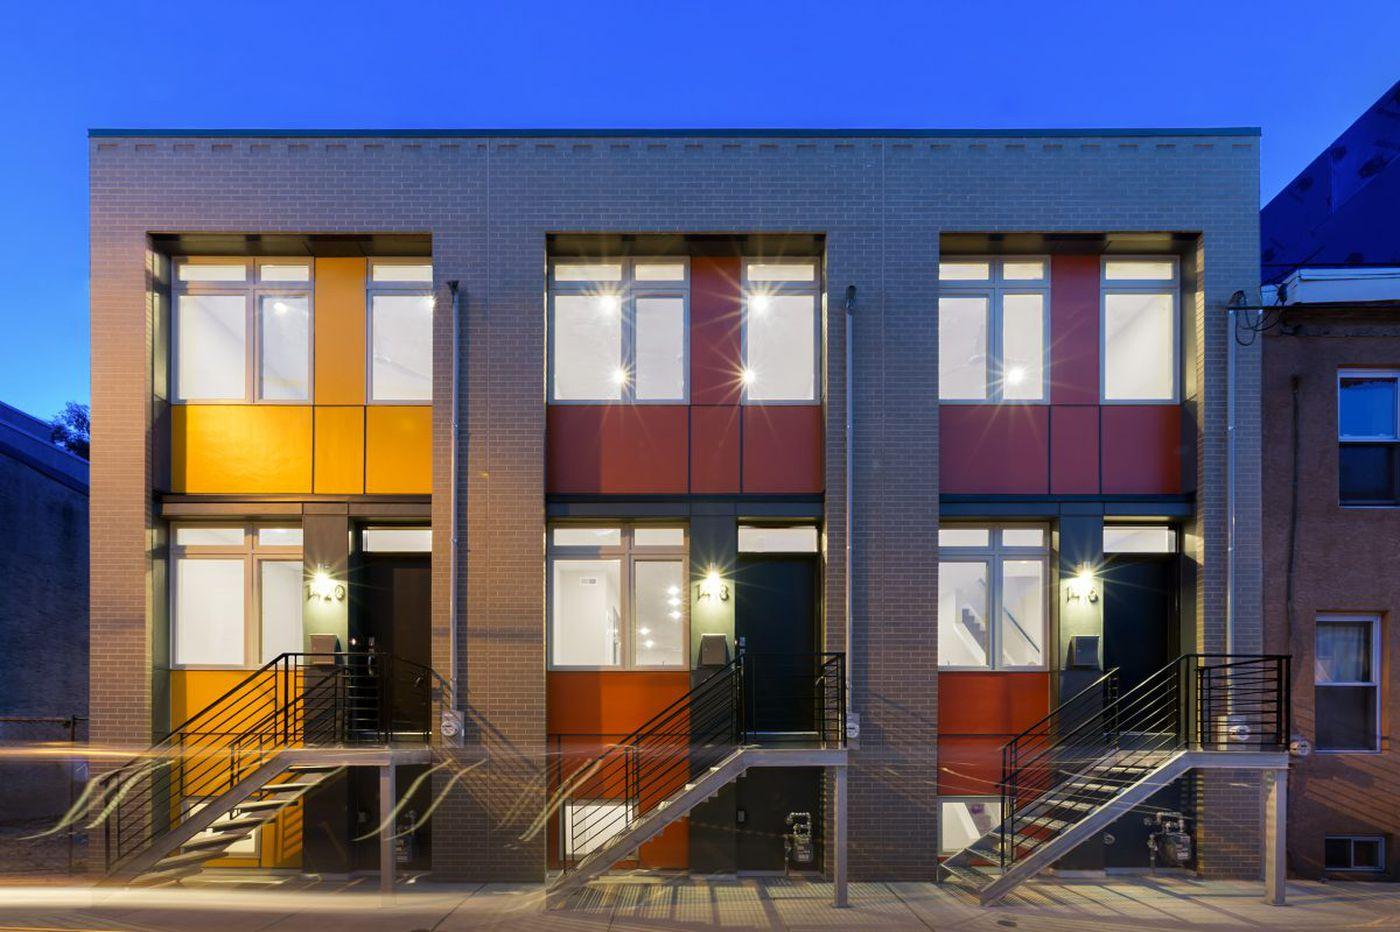 Philadelphia needs a comprehensive housing plan | Maria Quiñones Sánchez